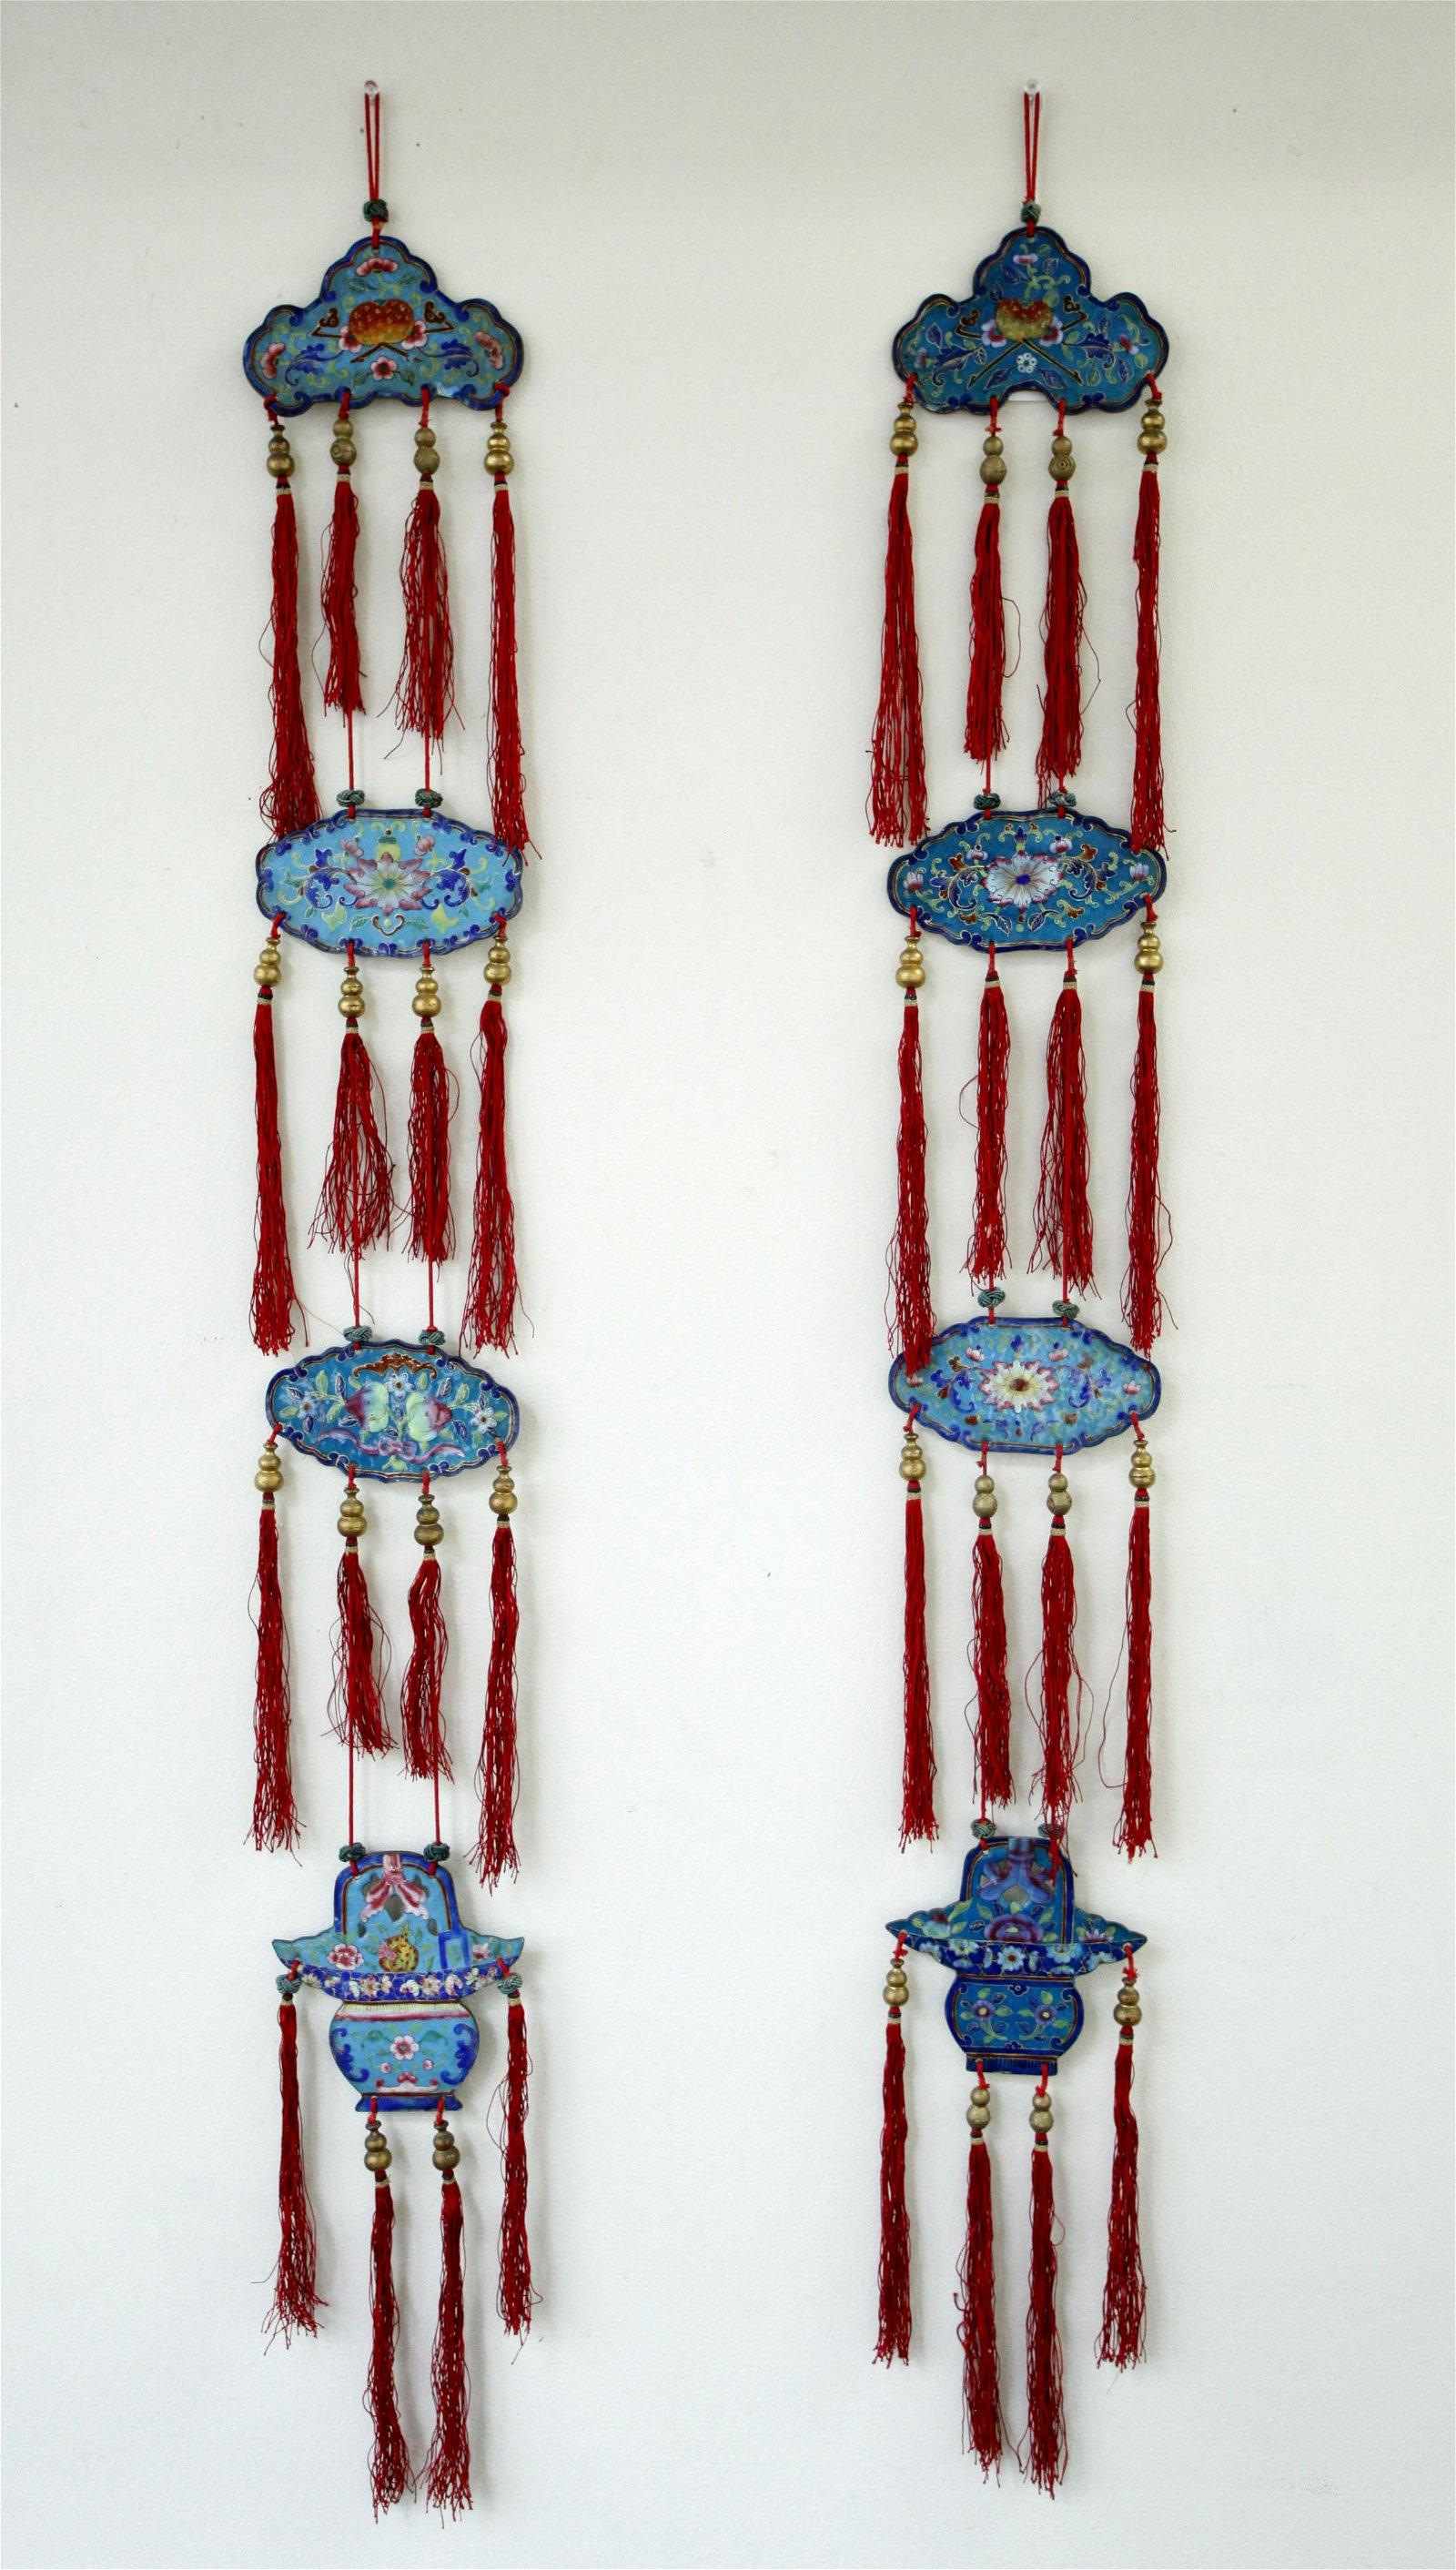 Pr Chinese Early 19C Canton Enamel & Silk Pendants